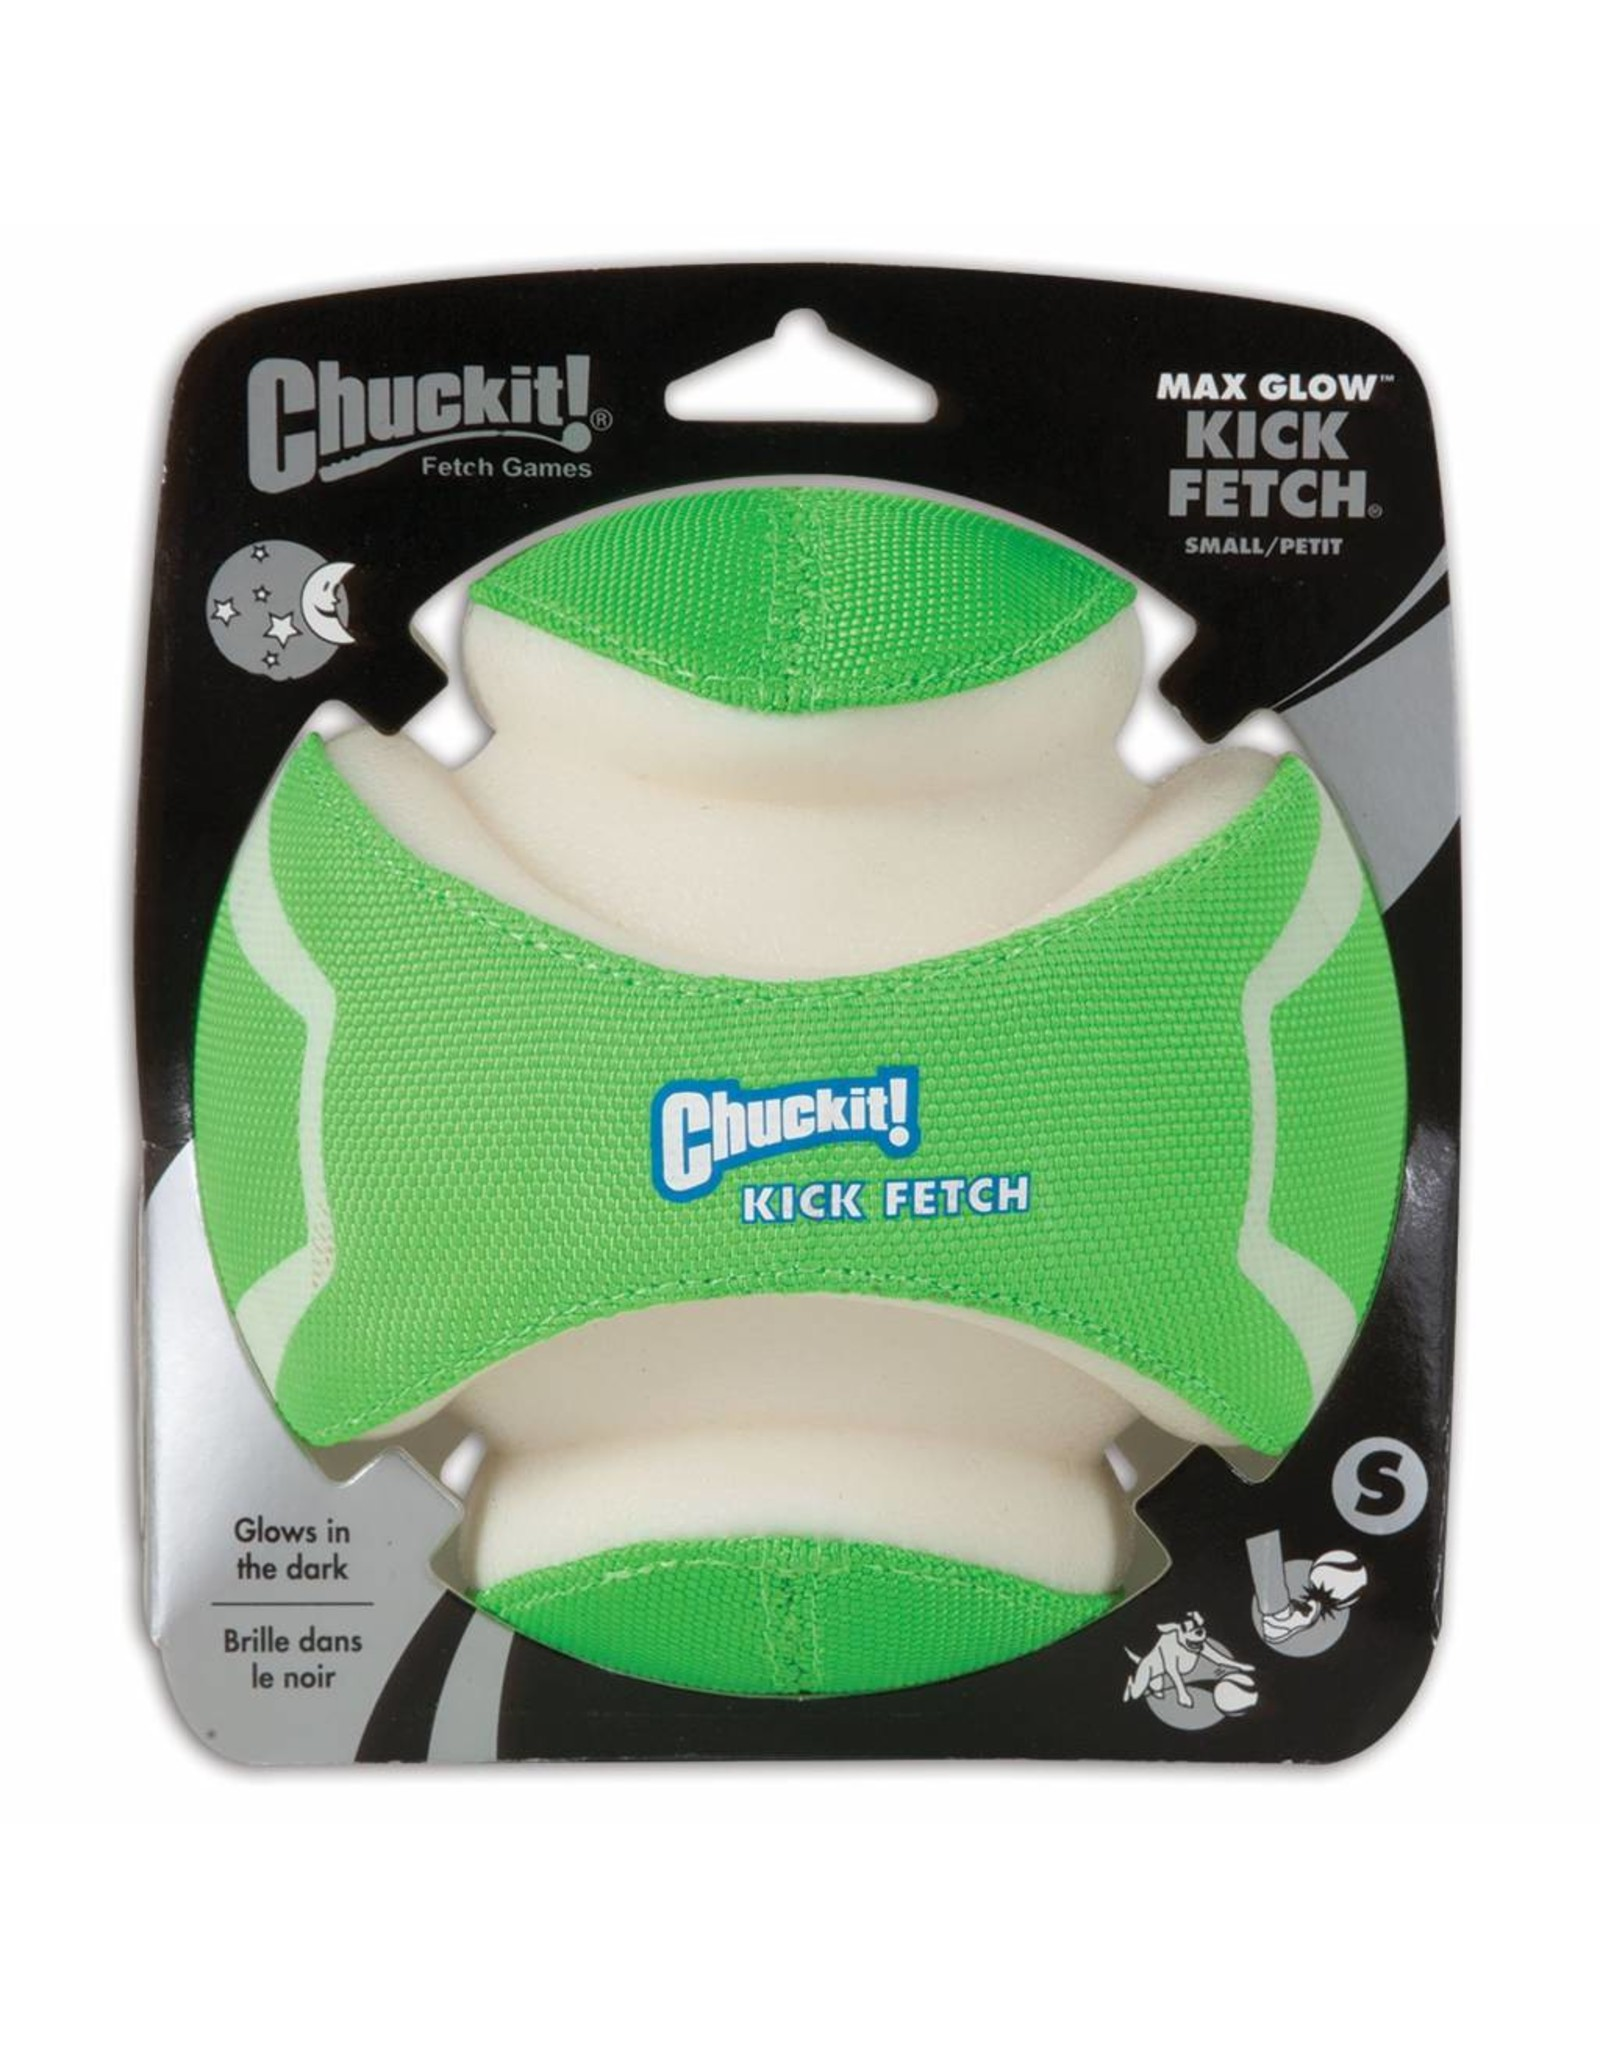 Chuckit Light Play Kick Fetch Dog Toy